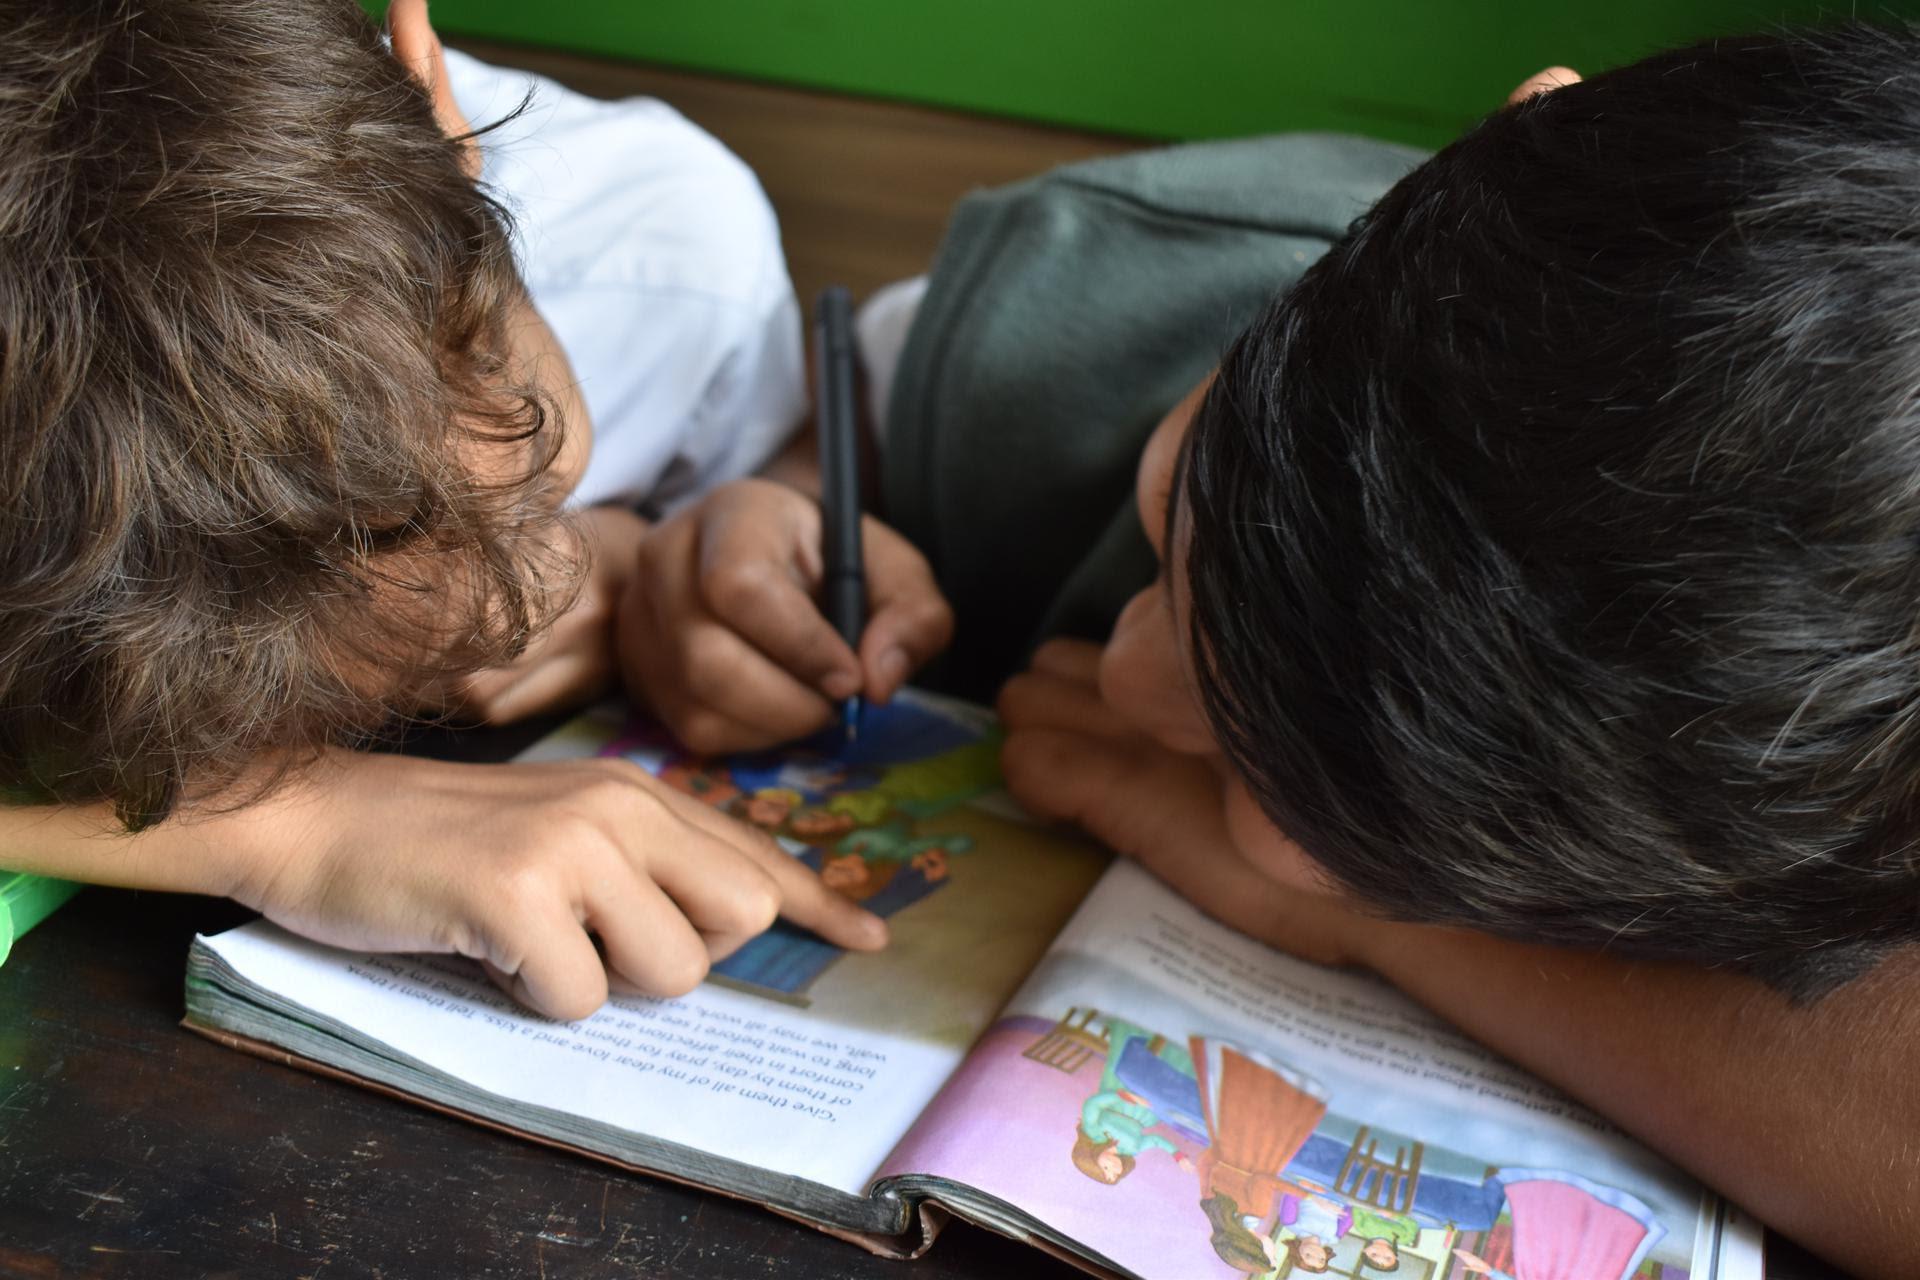 Two boys do homework together.